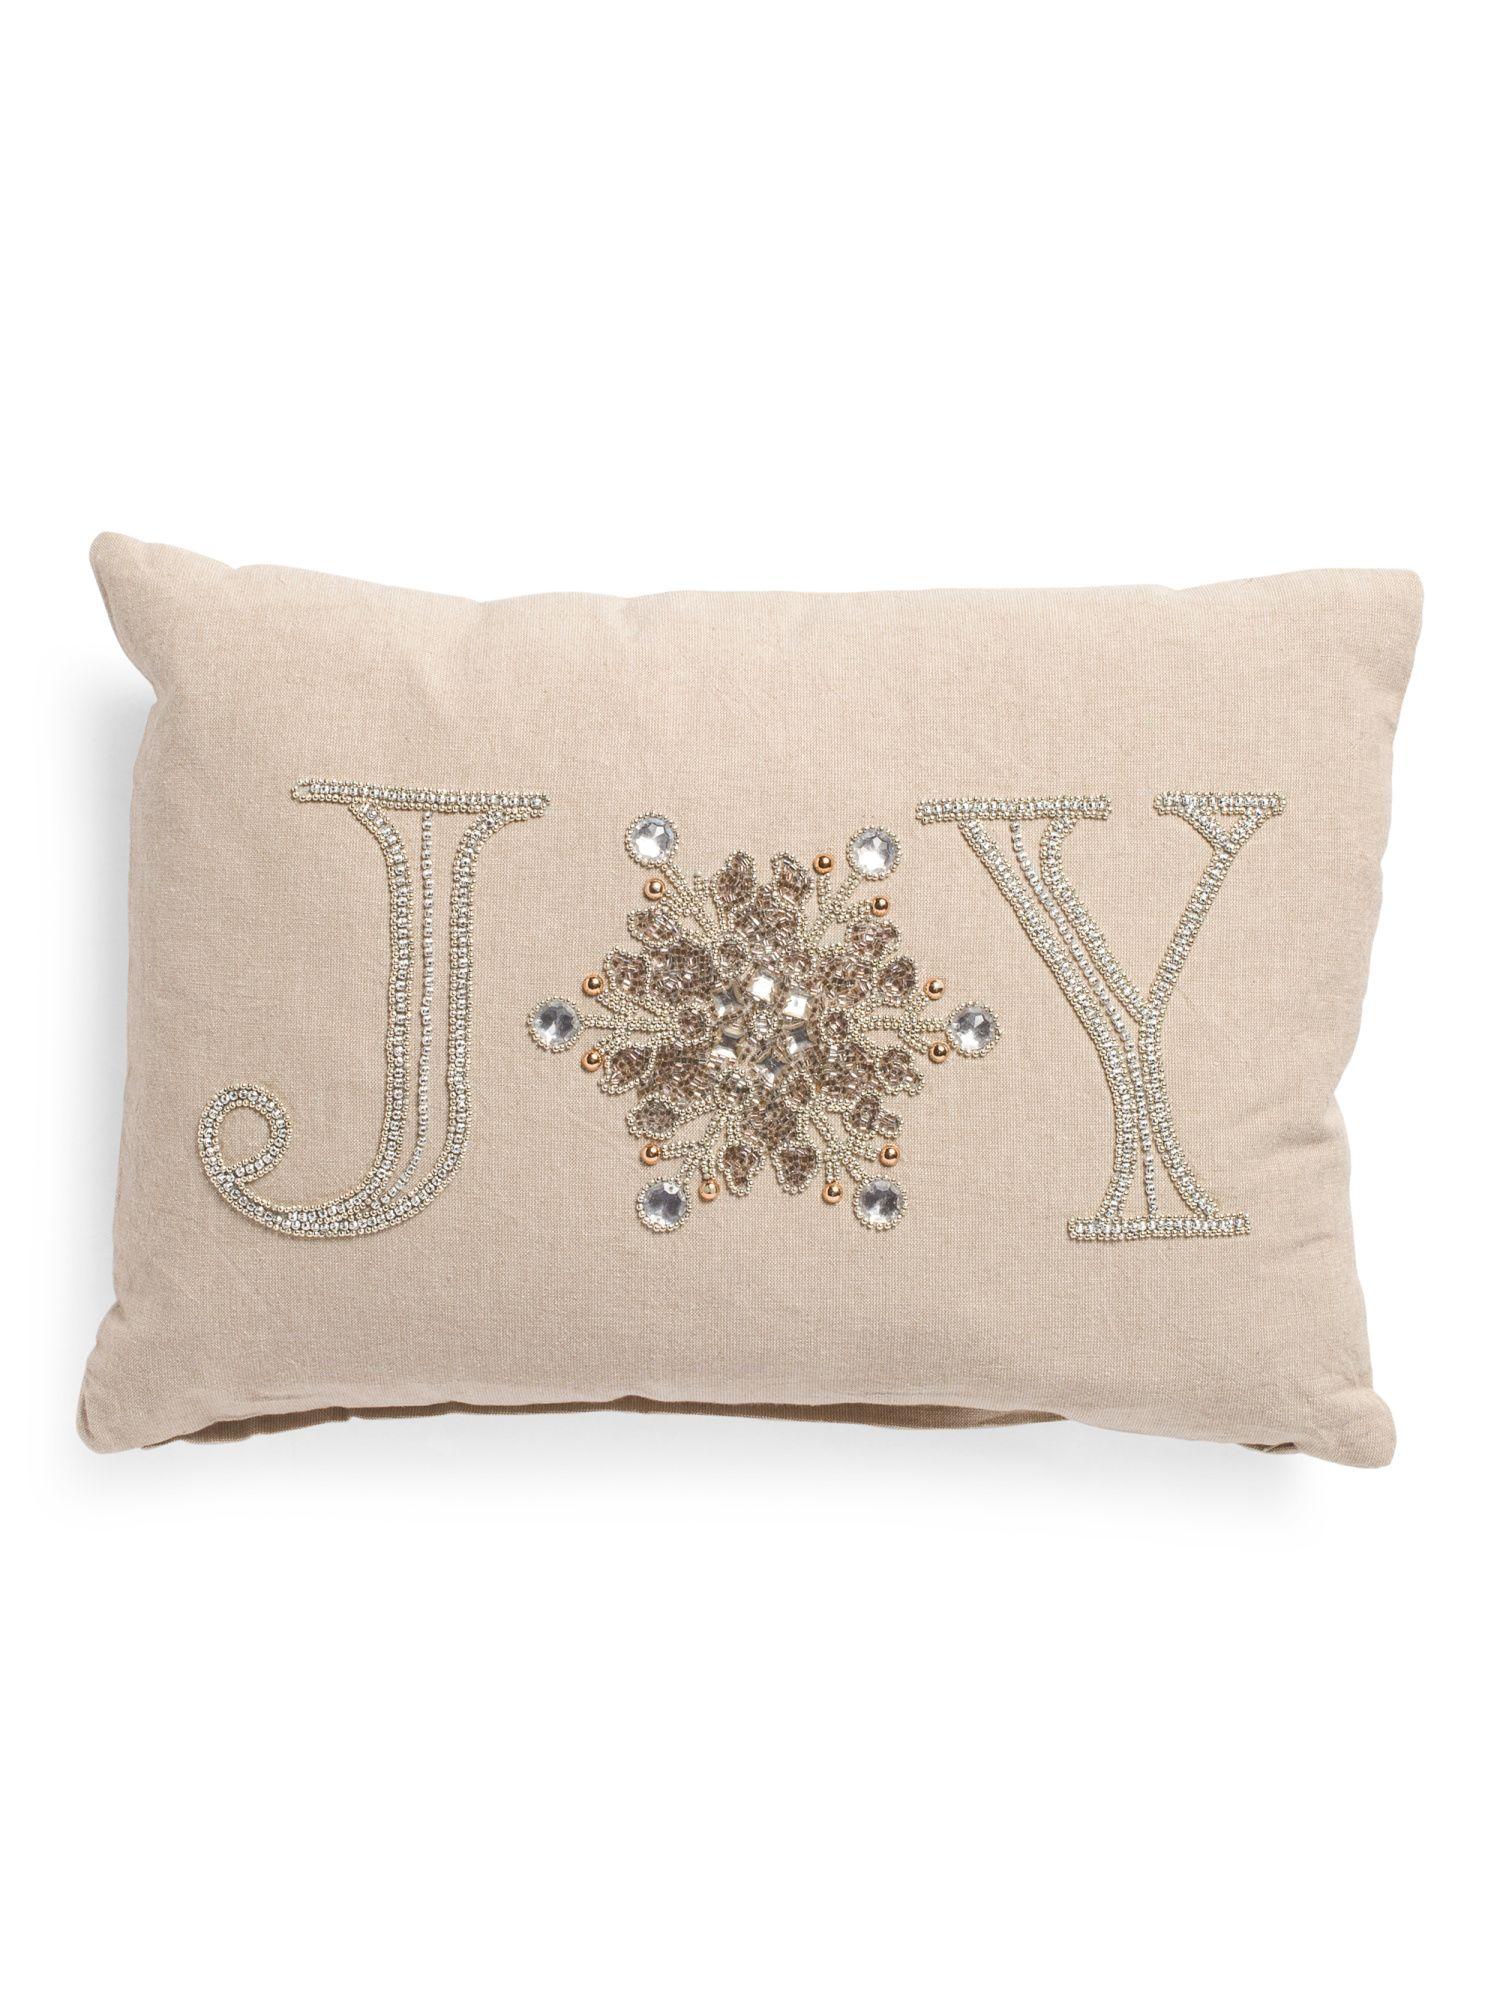 Made In India 14x20 Joy Beaded Pillow Beaded pillow